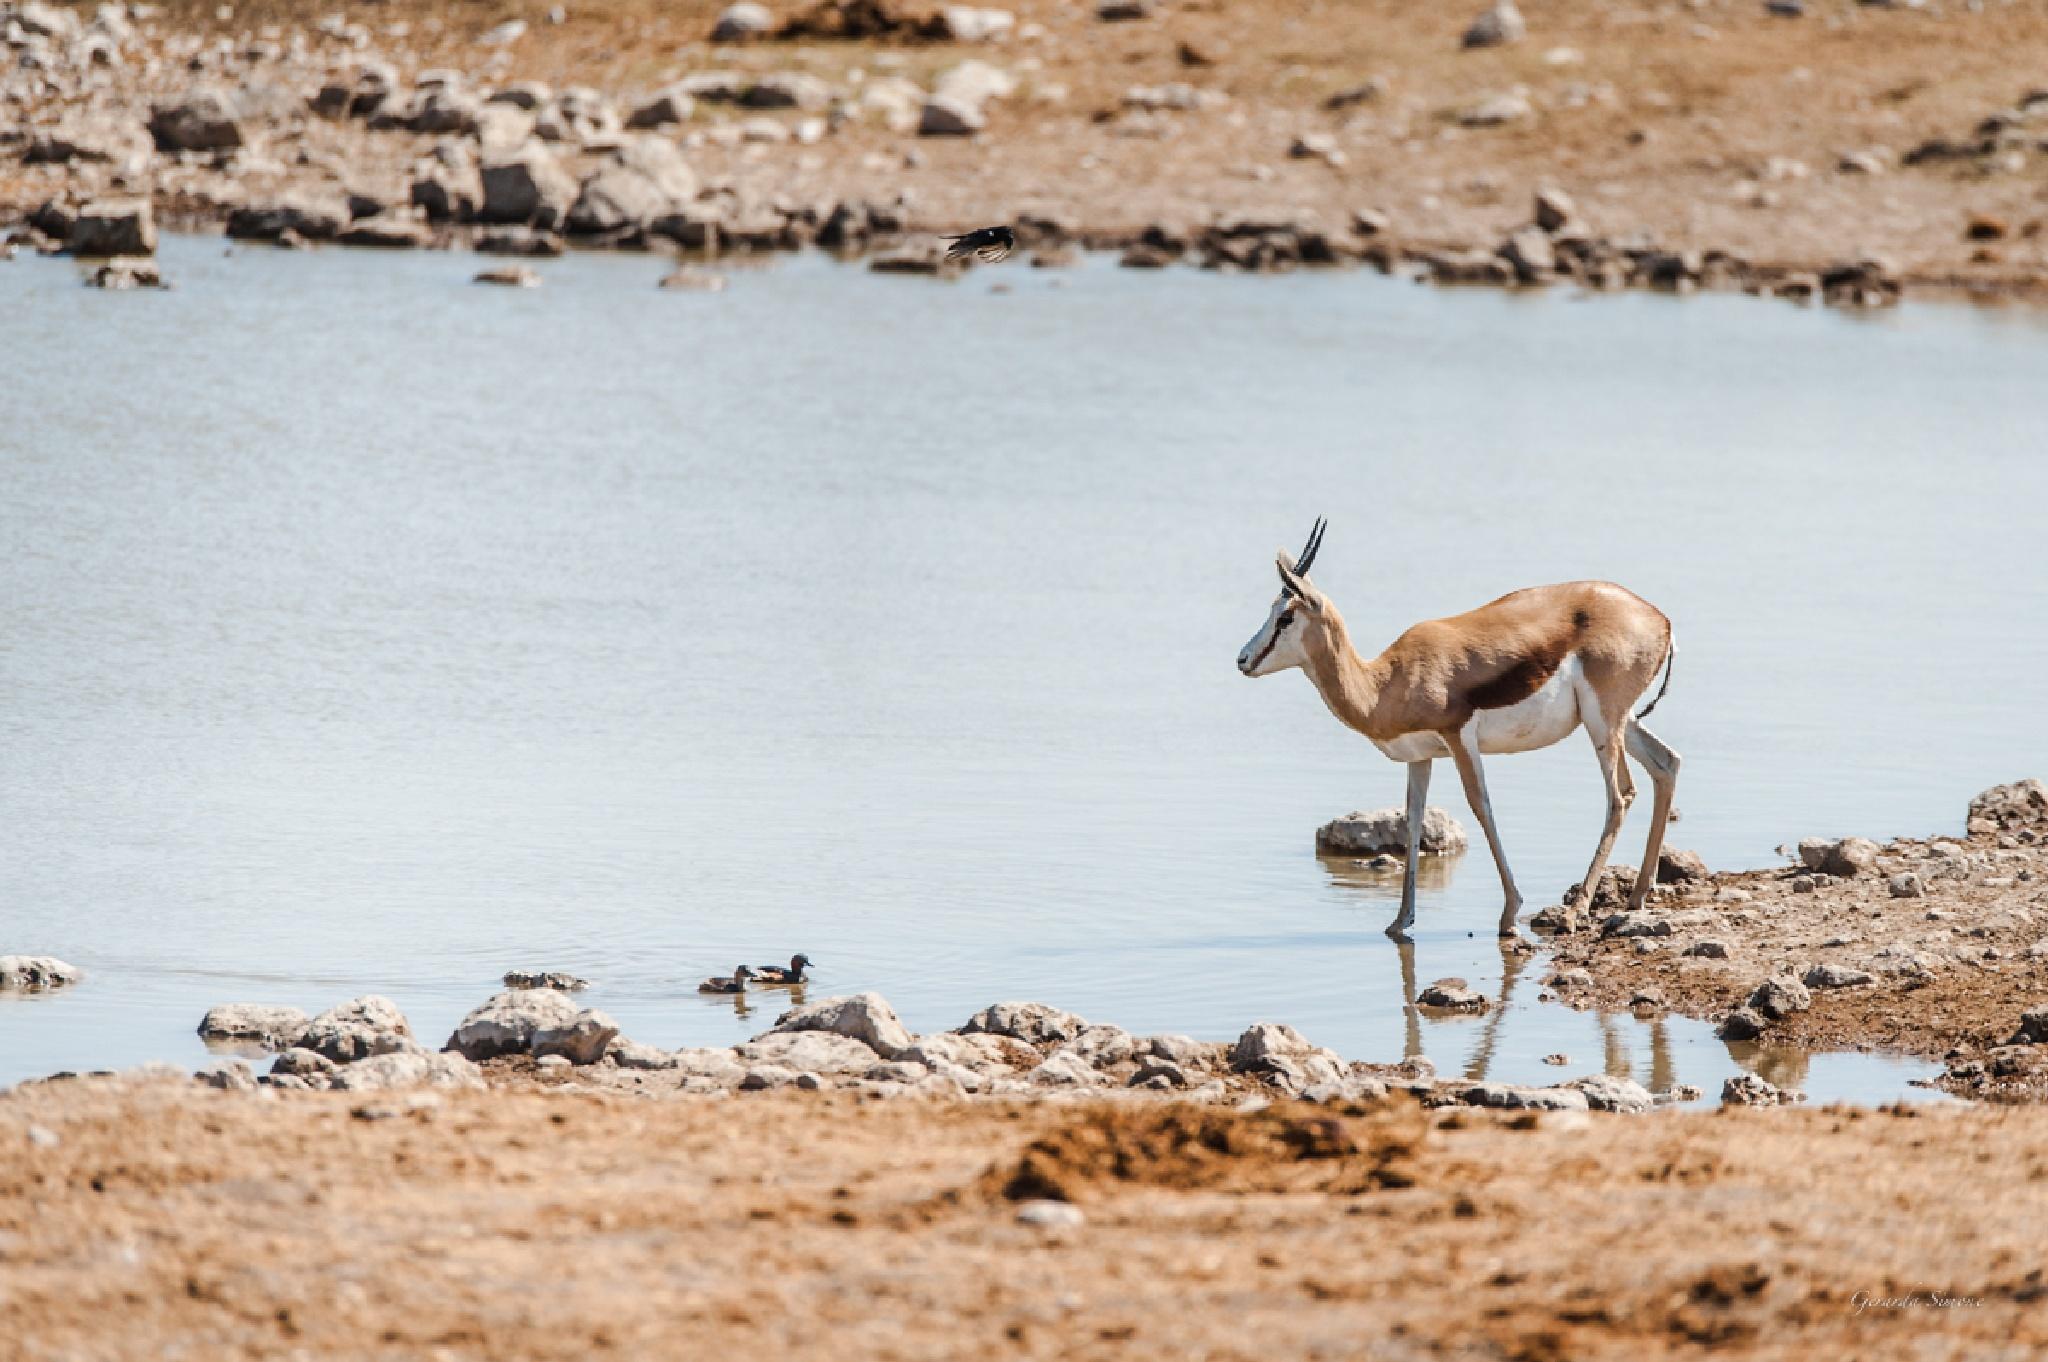 Springbok by gerarda.simone.7